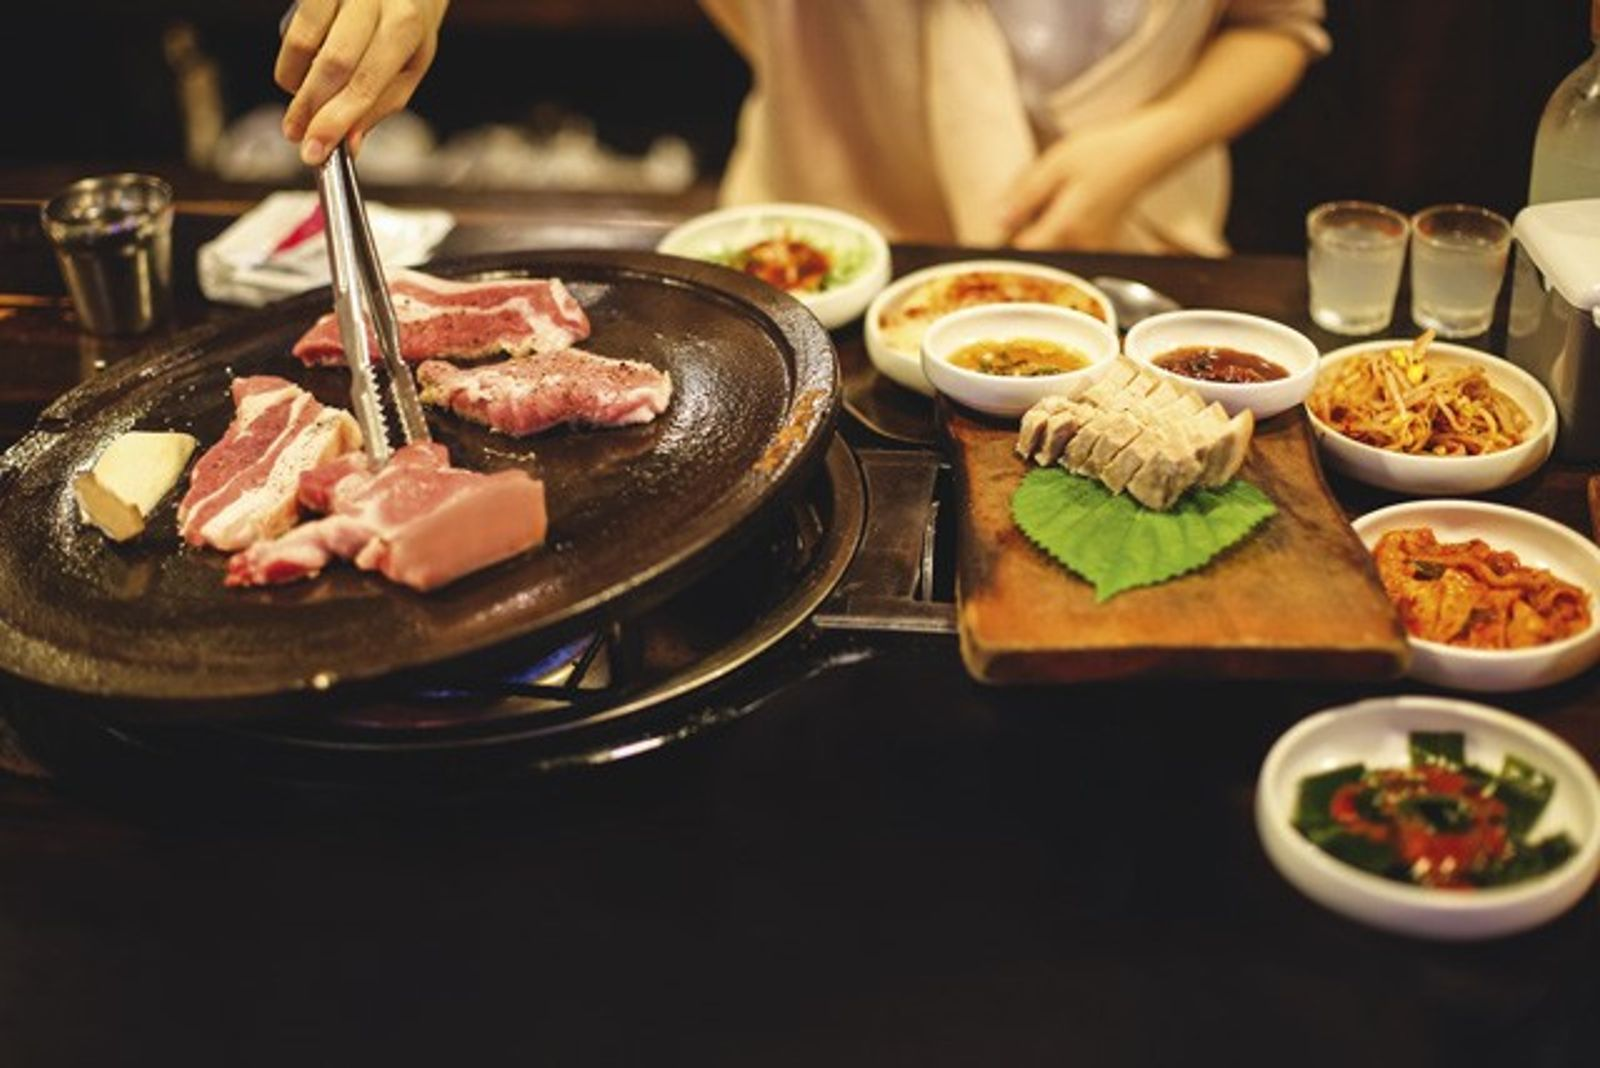 Bulgogi vs bibimbap: what to eat in South Korea